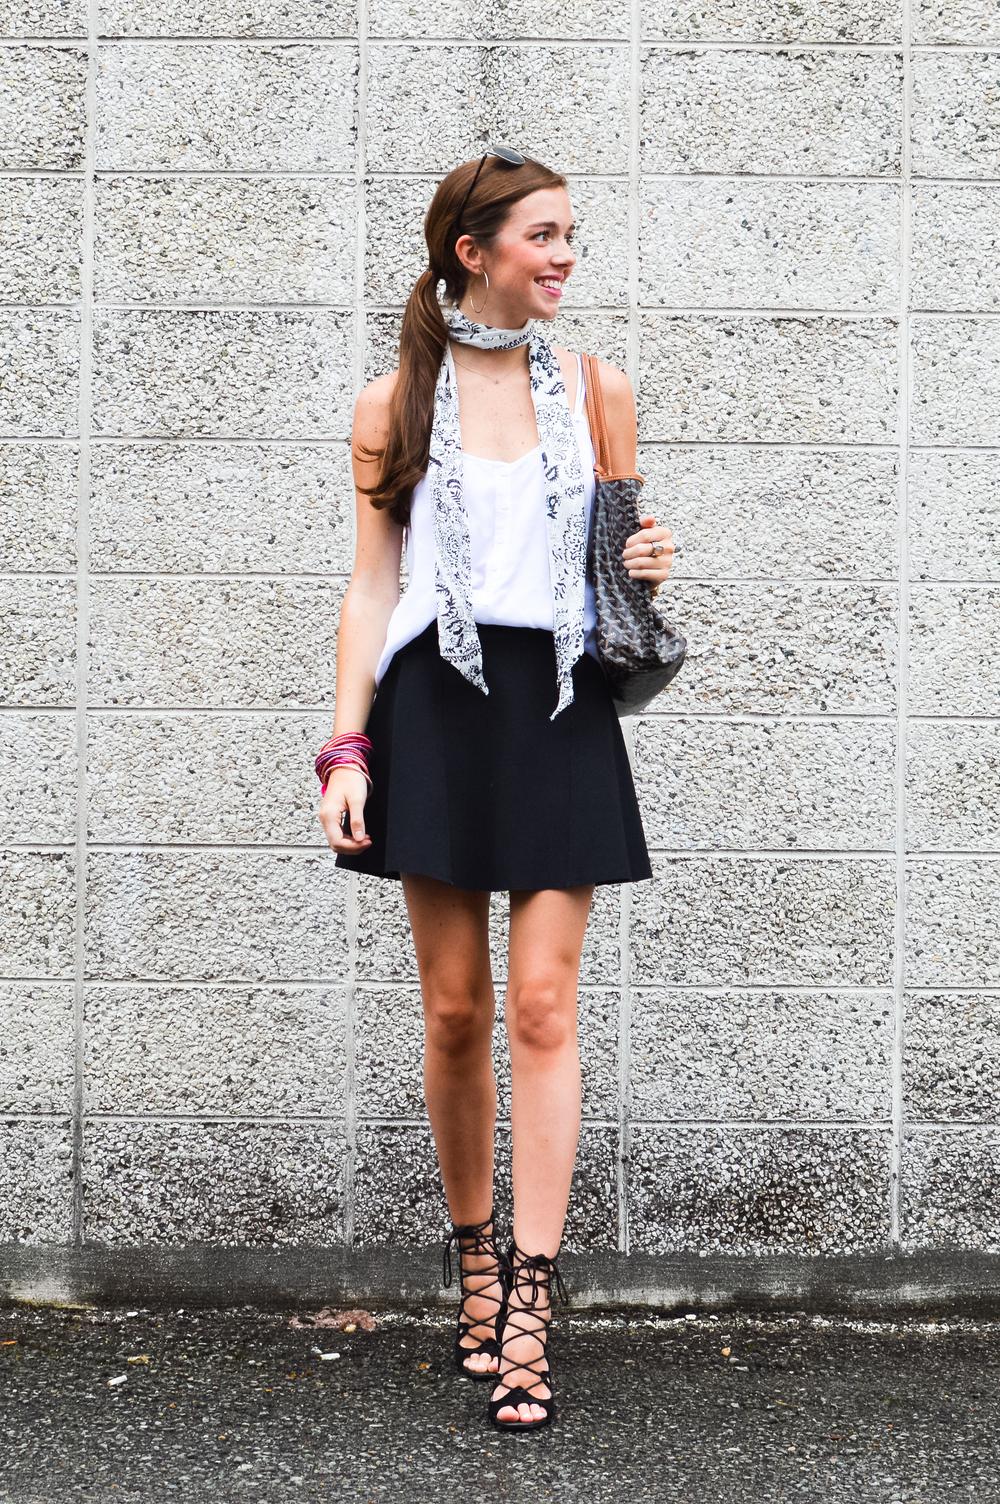 fashion blogger lcb style white black (19 of 35).jpg